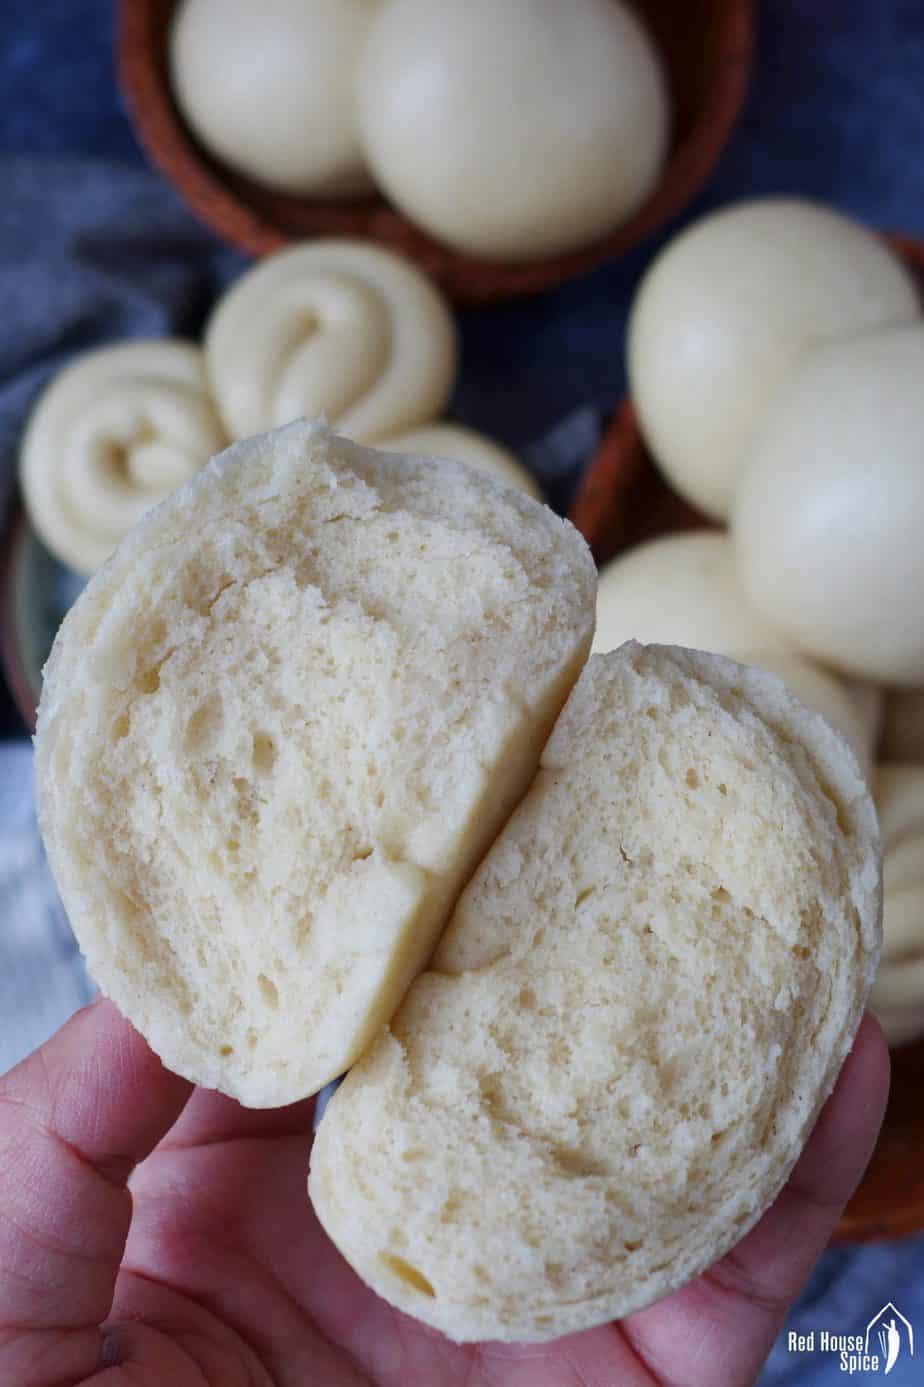 A Chinese steam bun torn into halves.